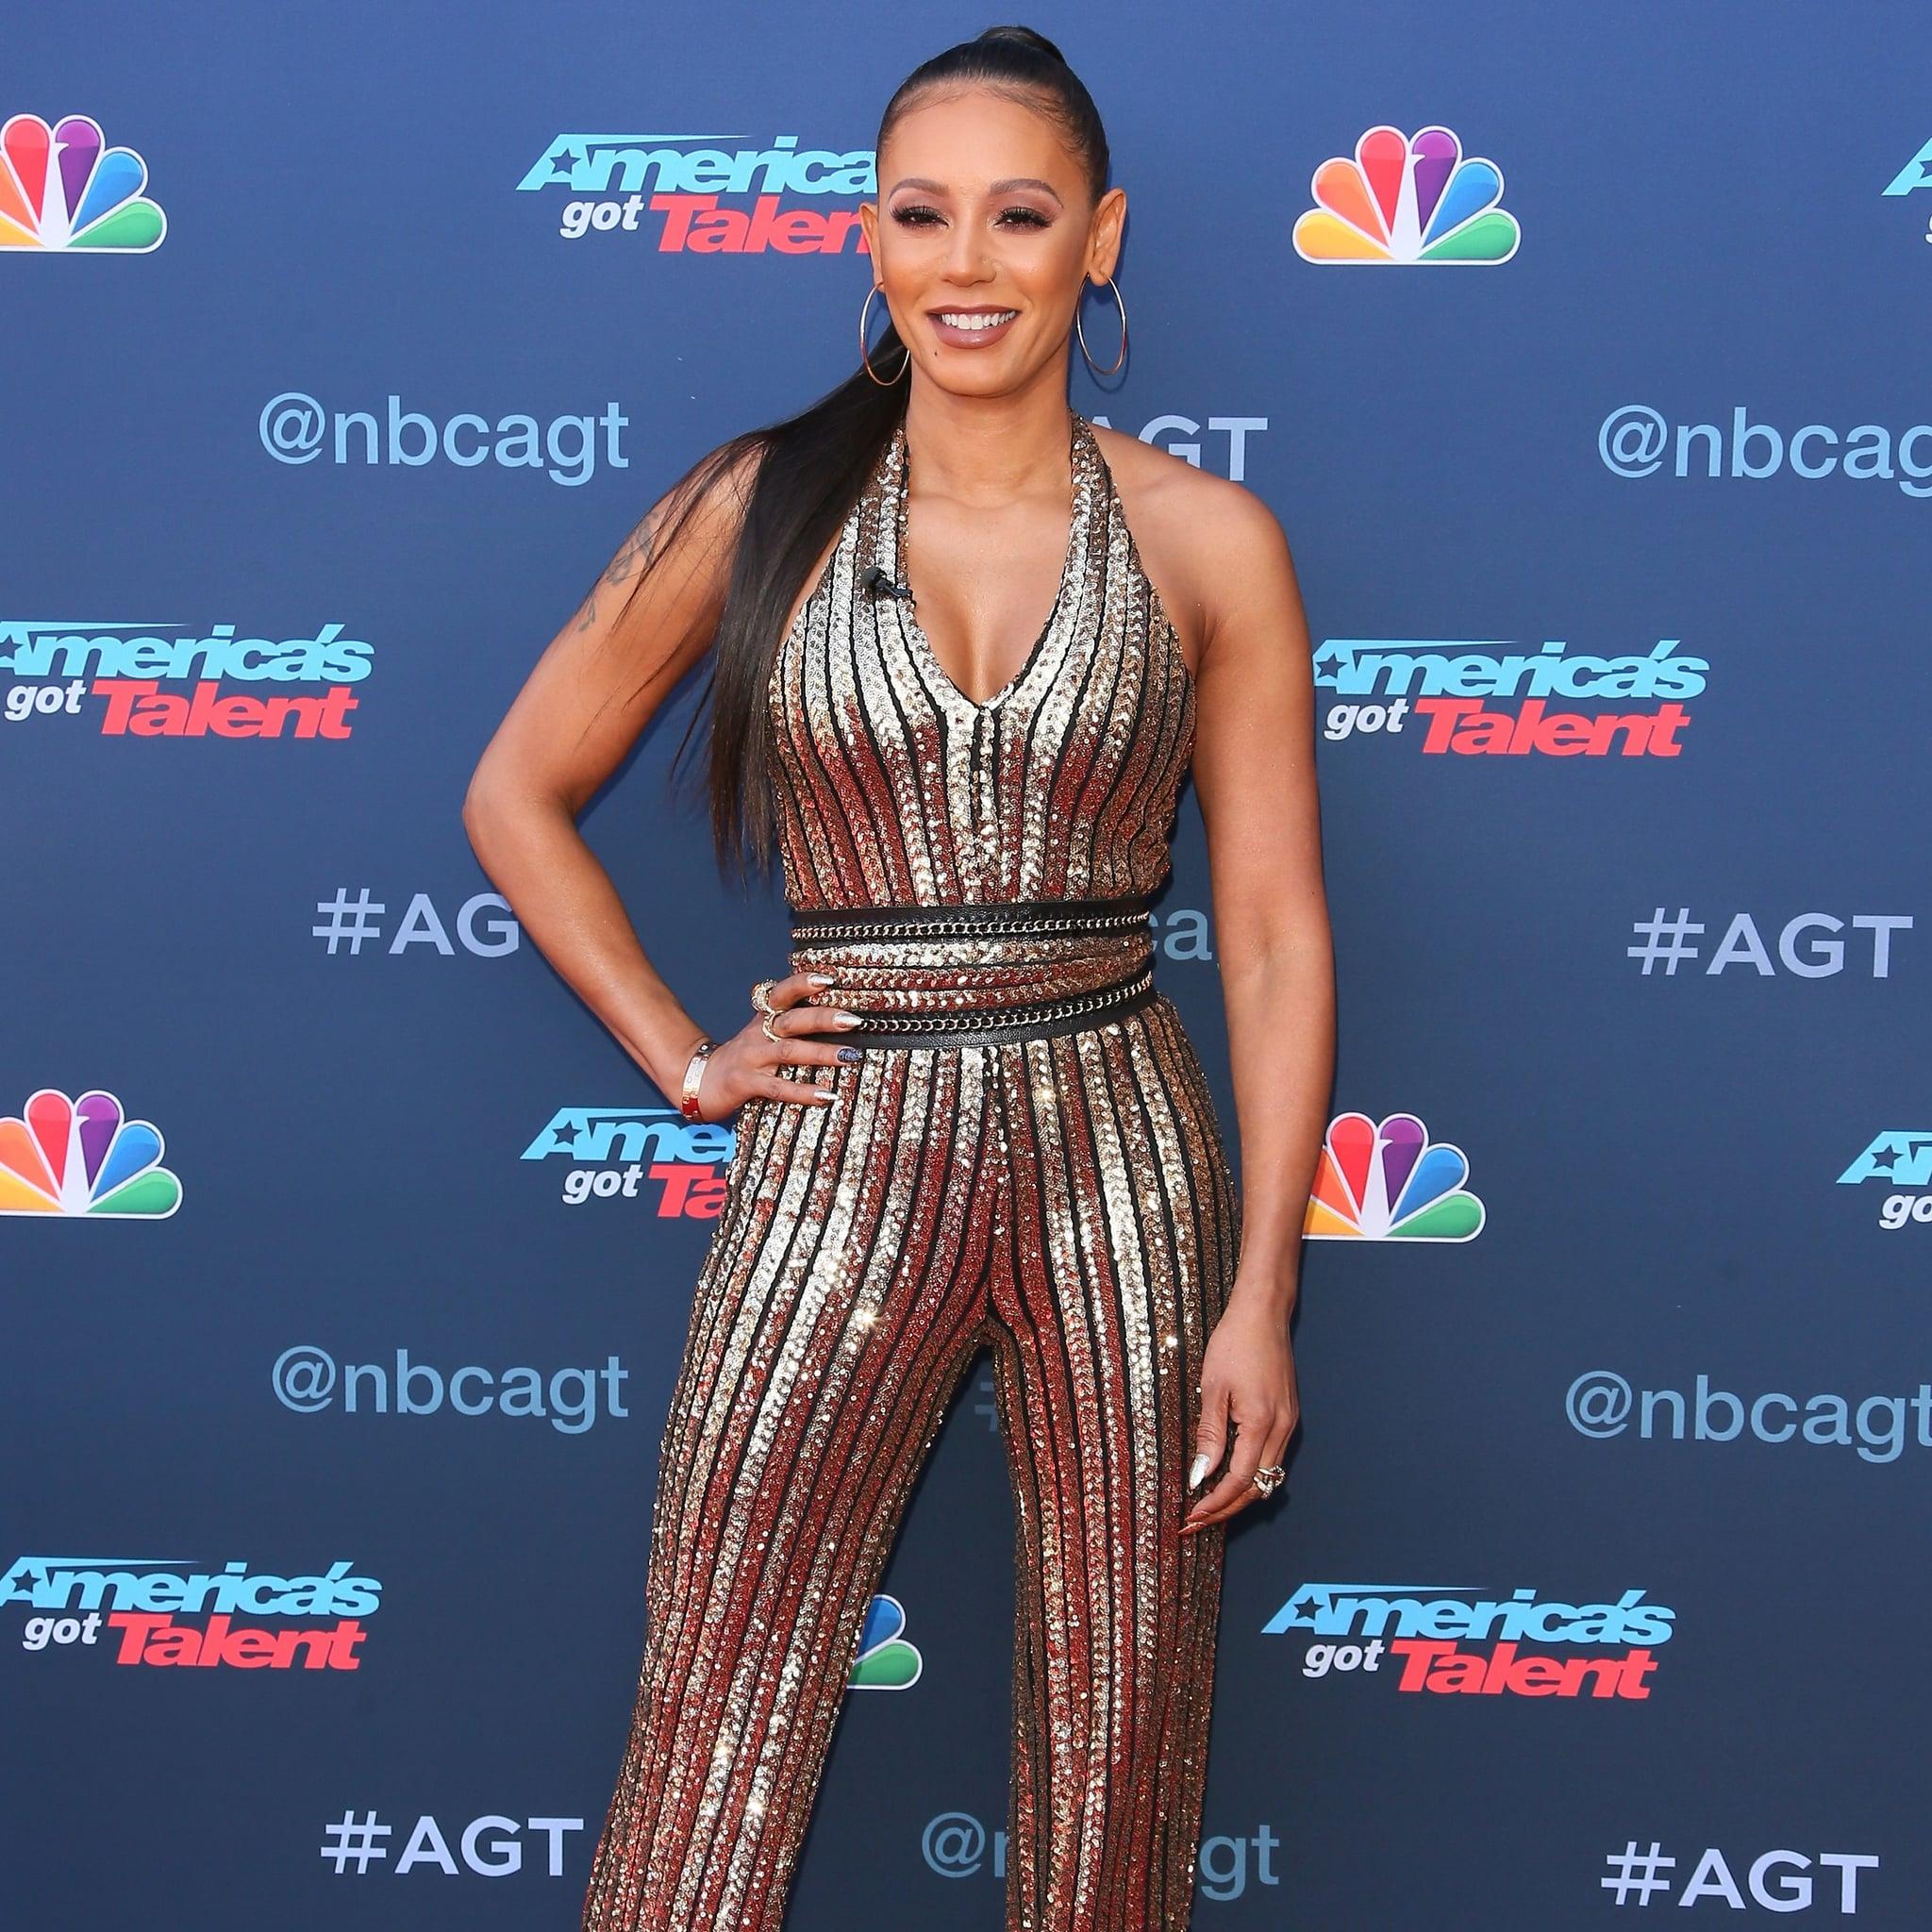 Americas got talent 2017 dates - Mel B At America S Got Talent Season 12 Event March 2017 Popsugar Celebrity